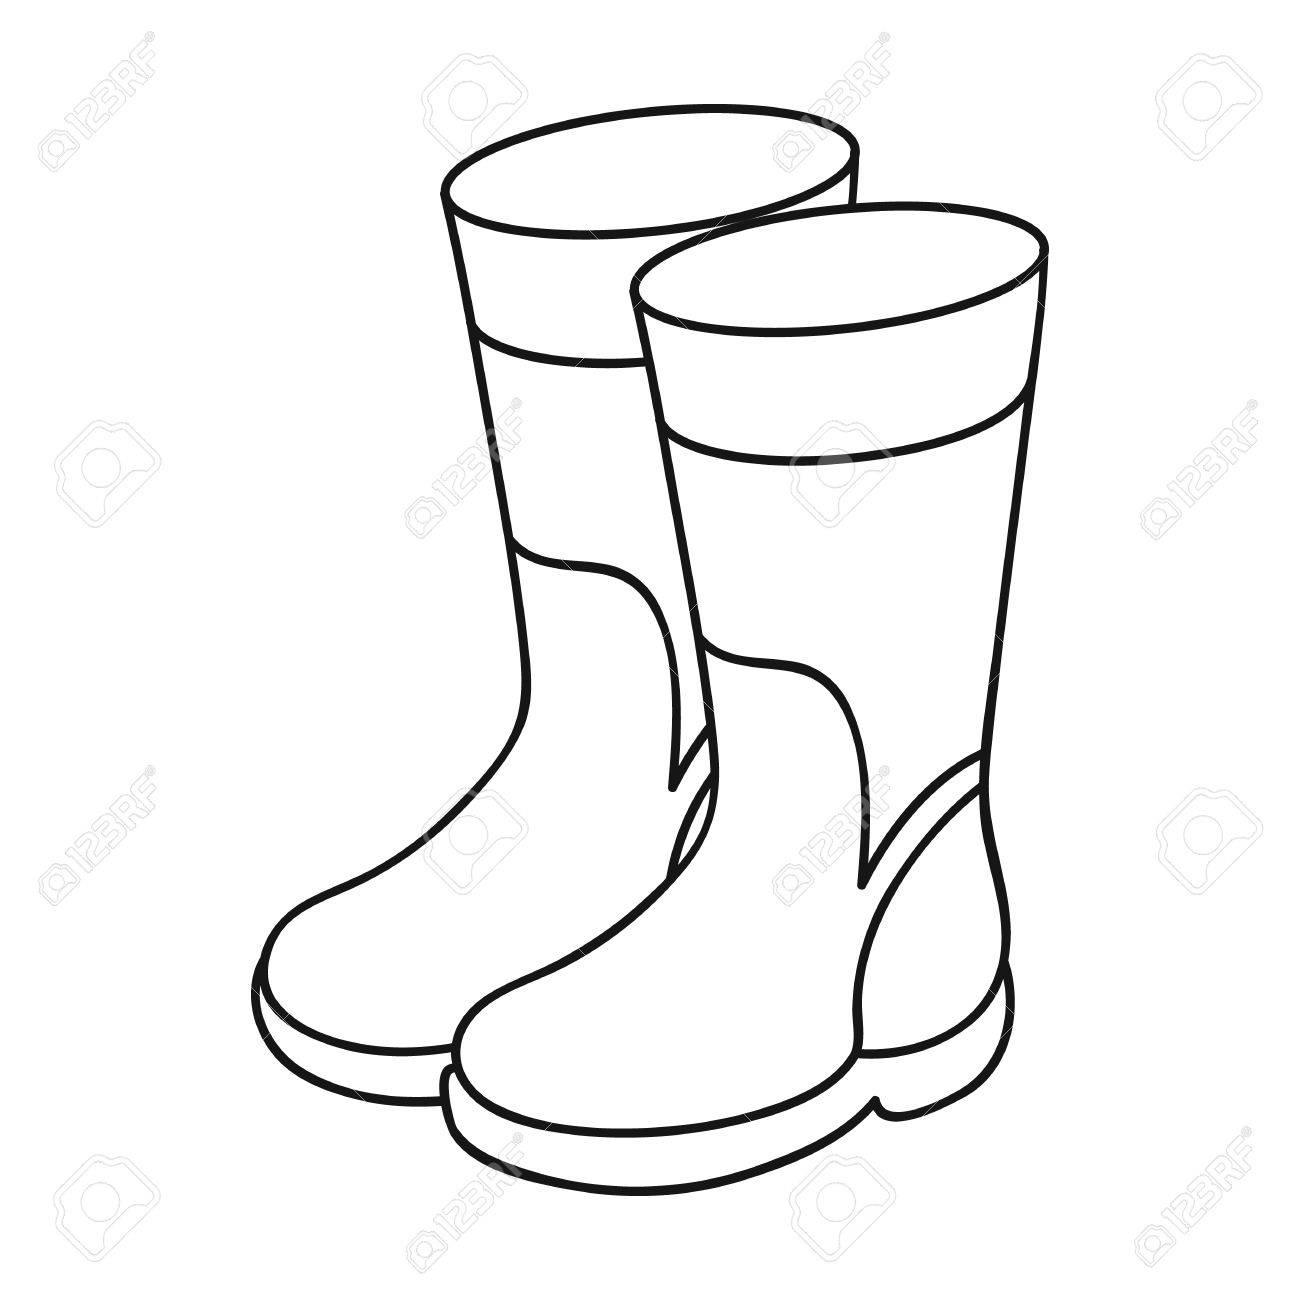 Rain at getdrawings com. Boots clipart drawing